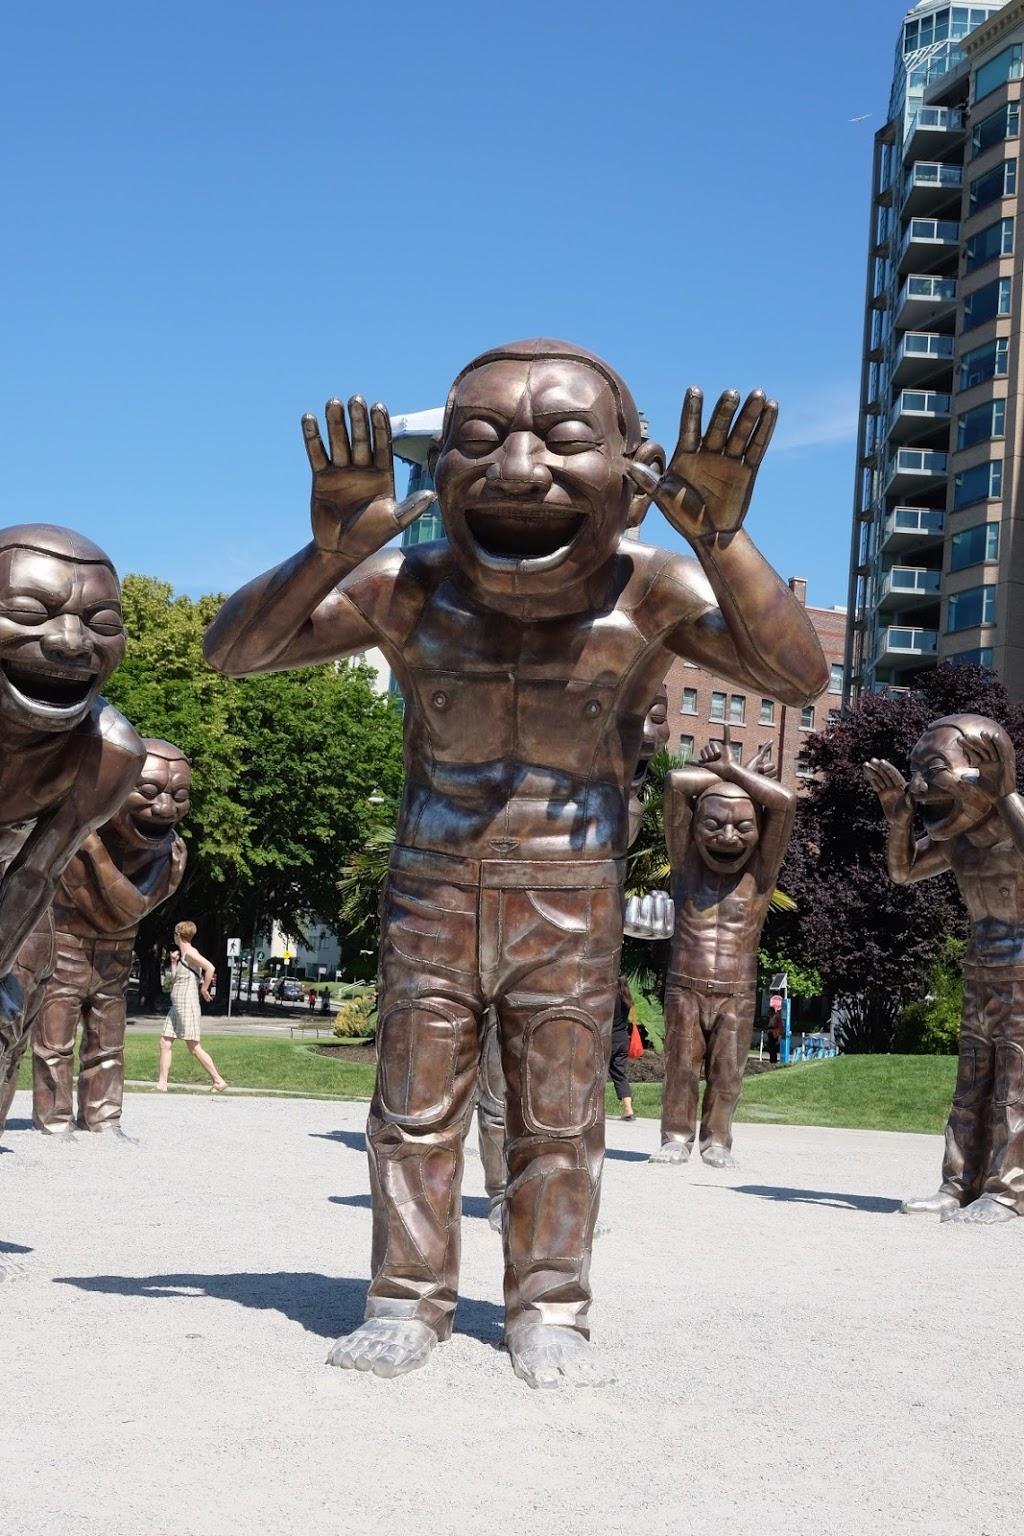 Morton Park | park | 1800 Morton Ave, Vancouver, BC V6G, Canada | 6048737000 OR +1 604-873-7000